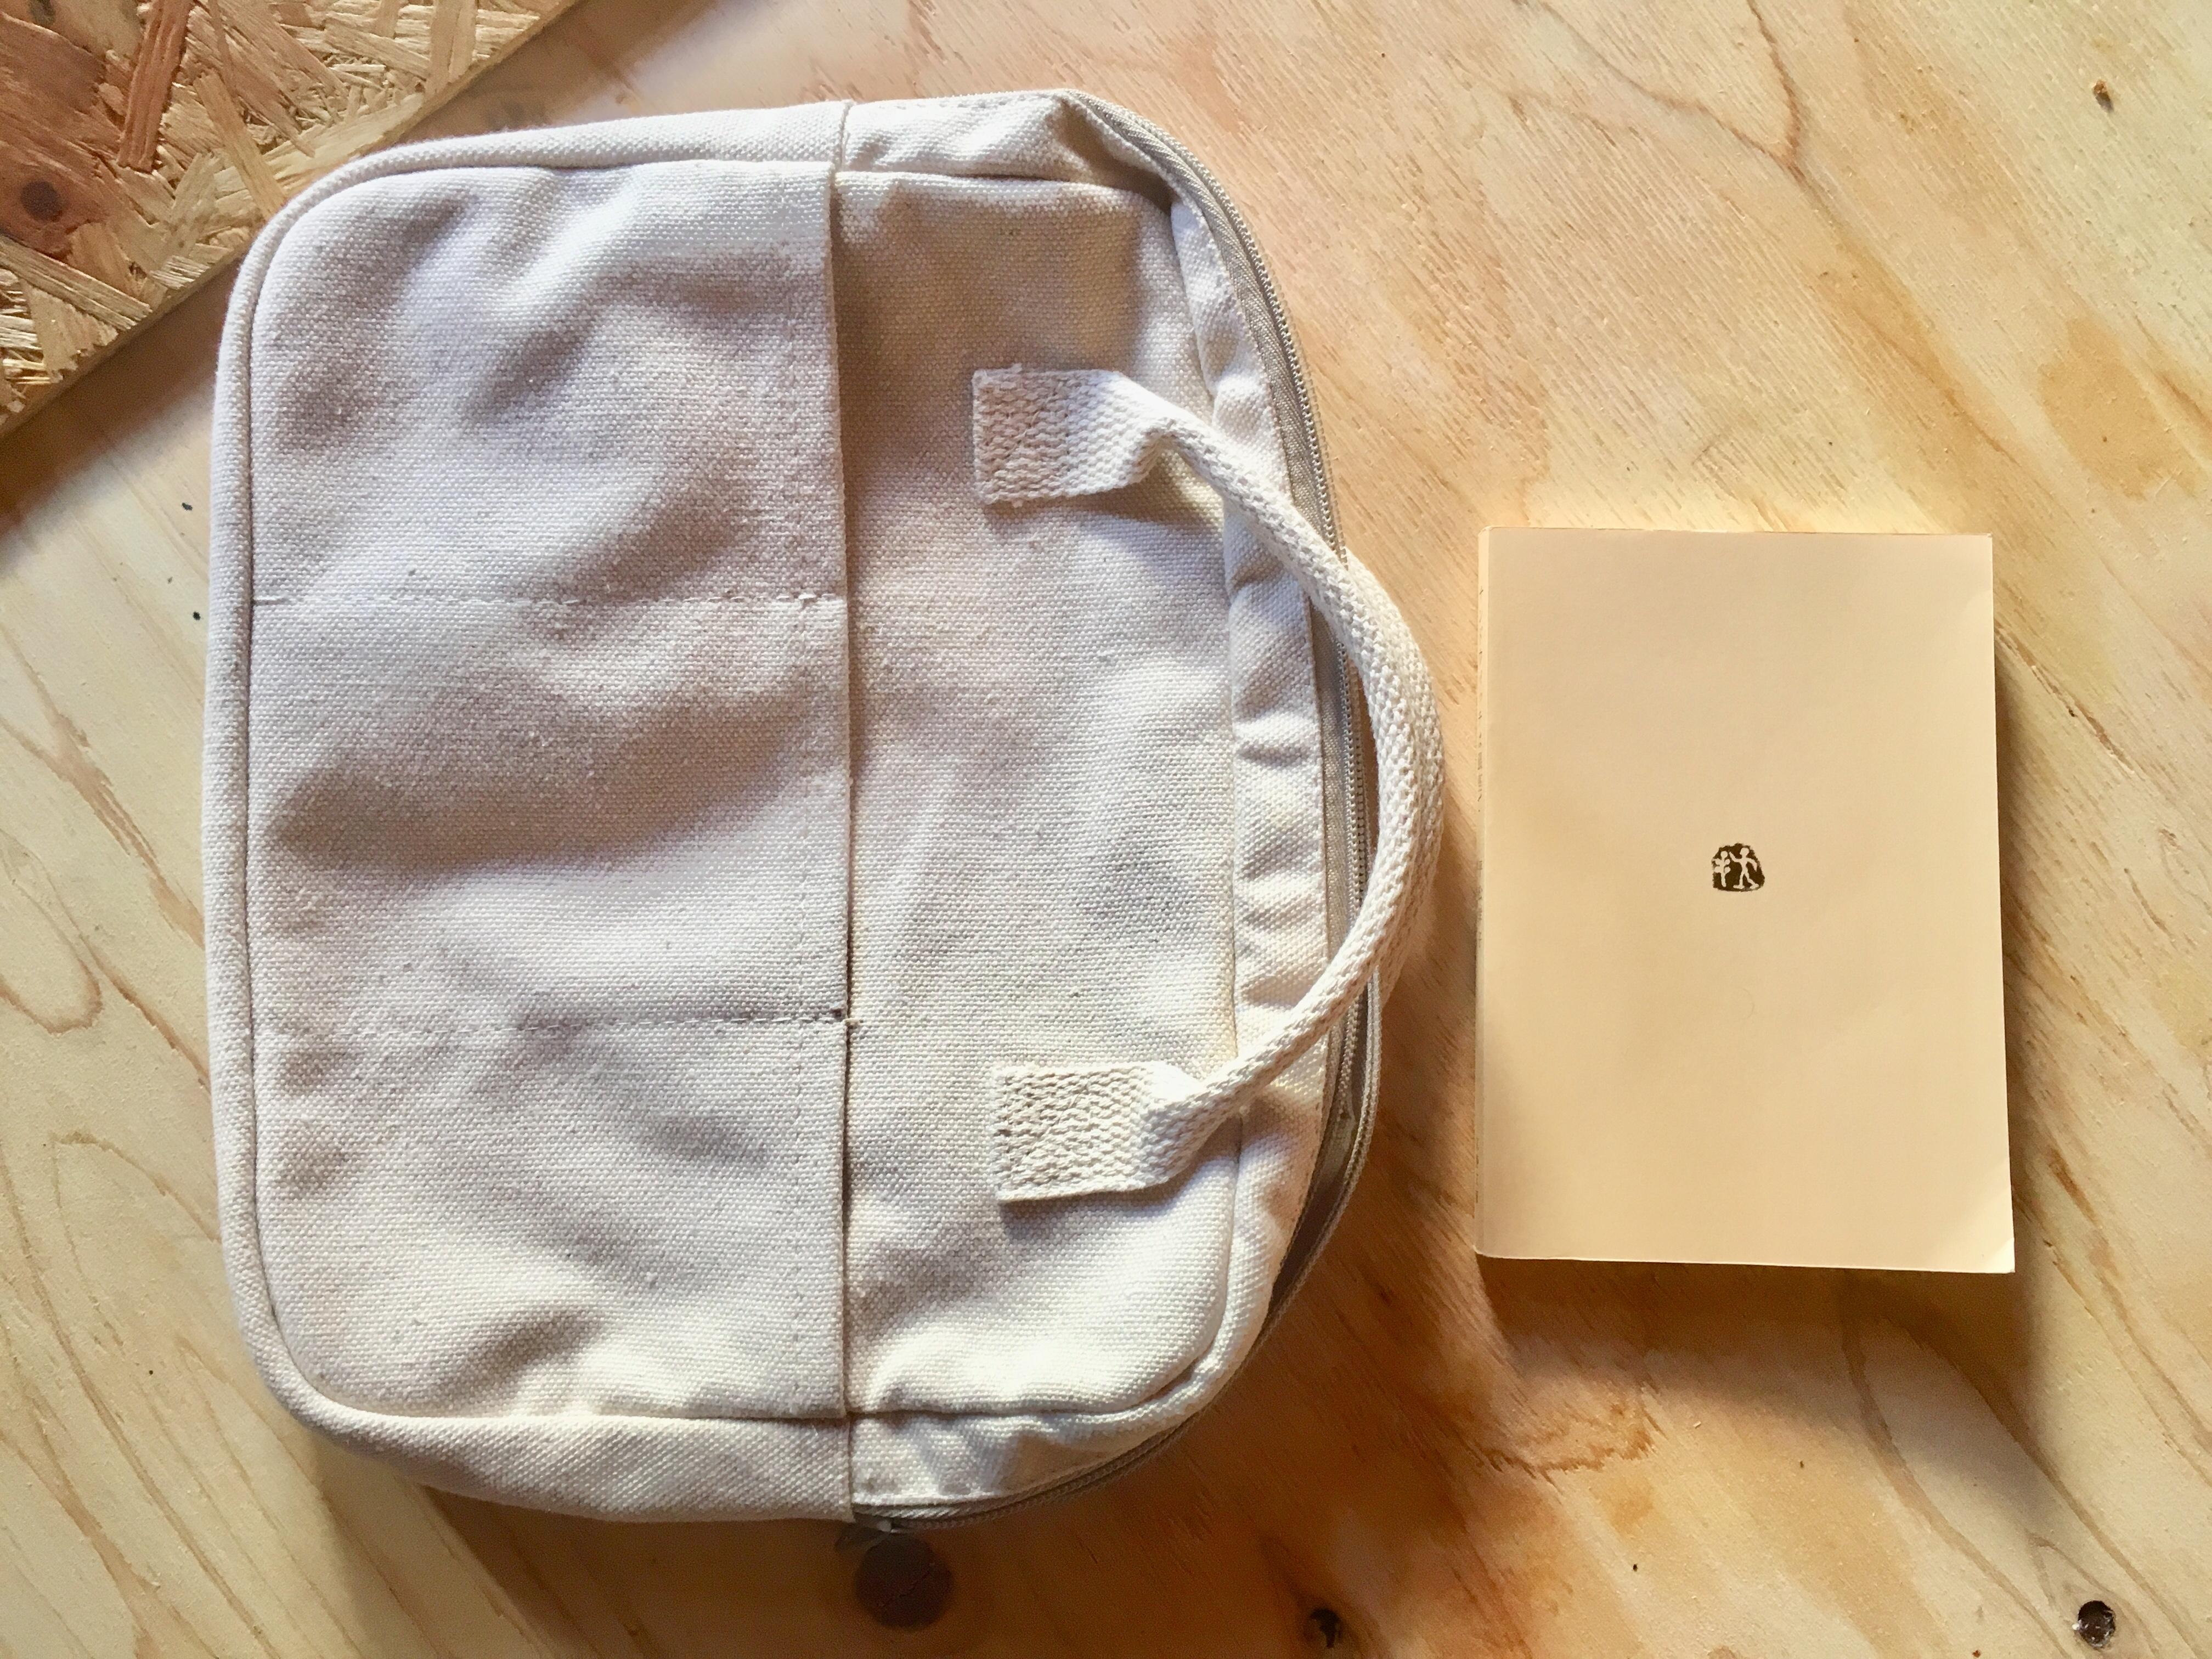 02d72a40f076 コンパクトでかわいい~. ニトリから発売されたバッグインバッグ「マルチポケット ミニバック」はとっても ...